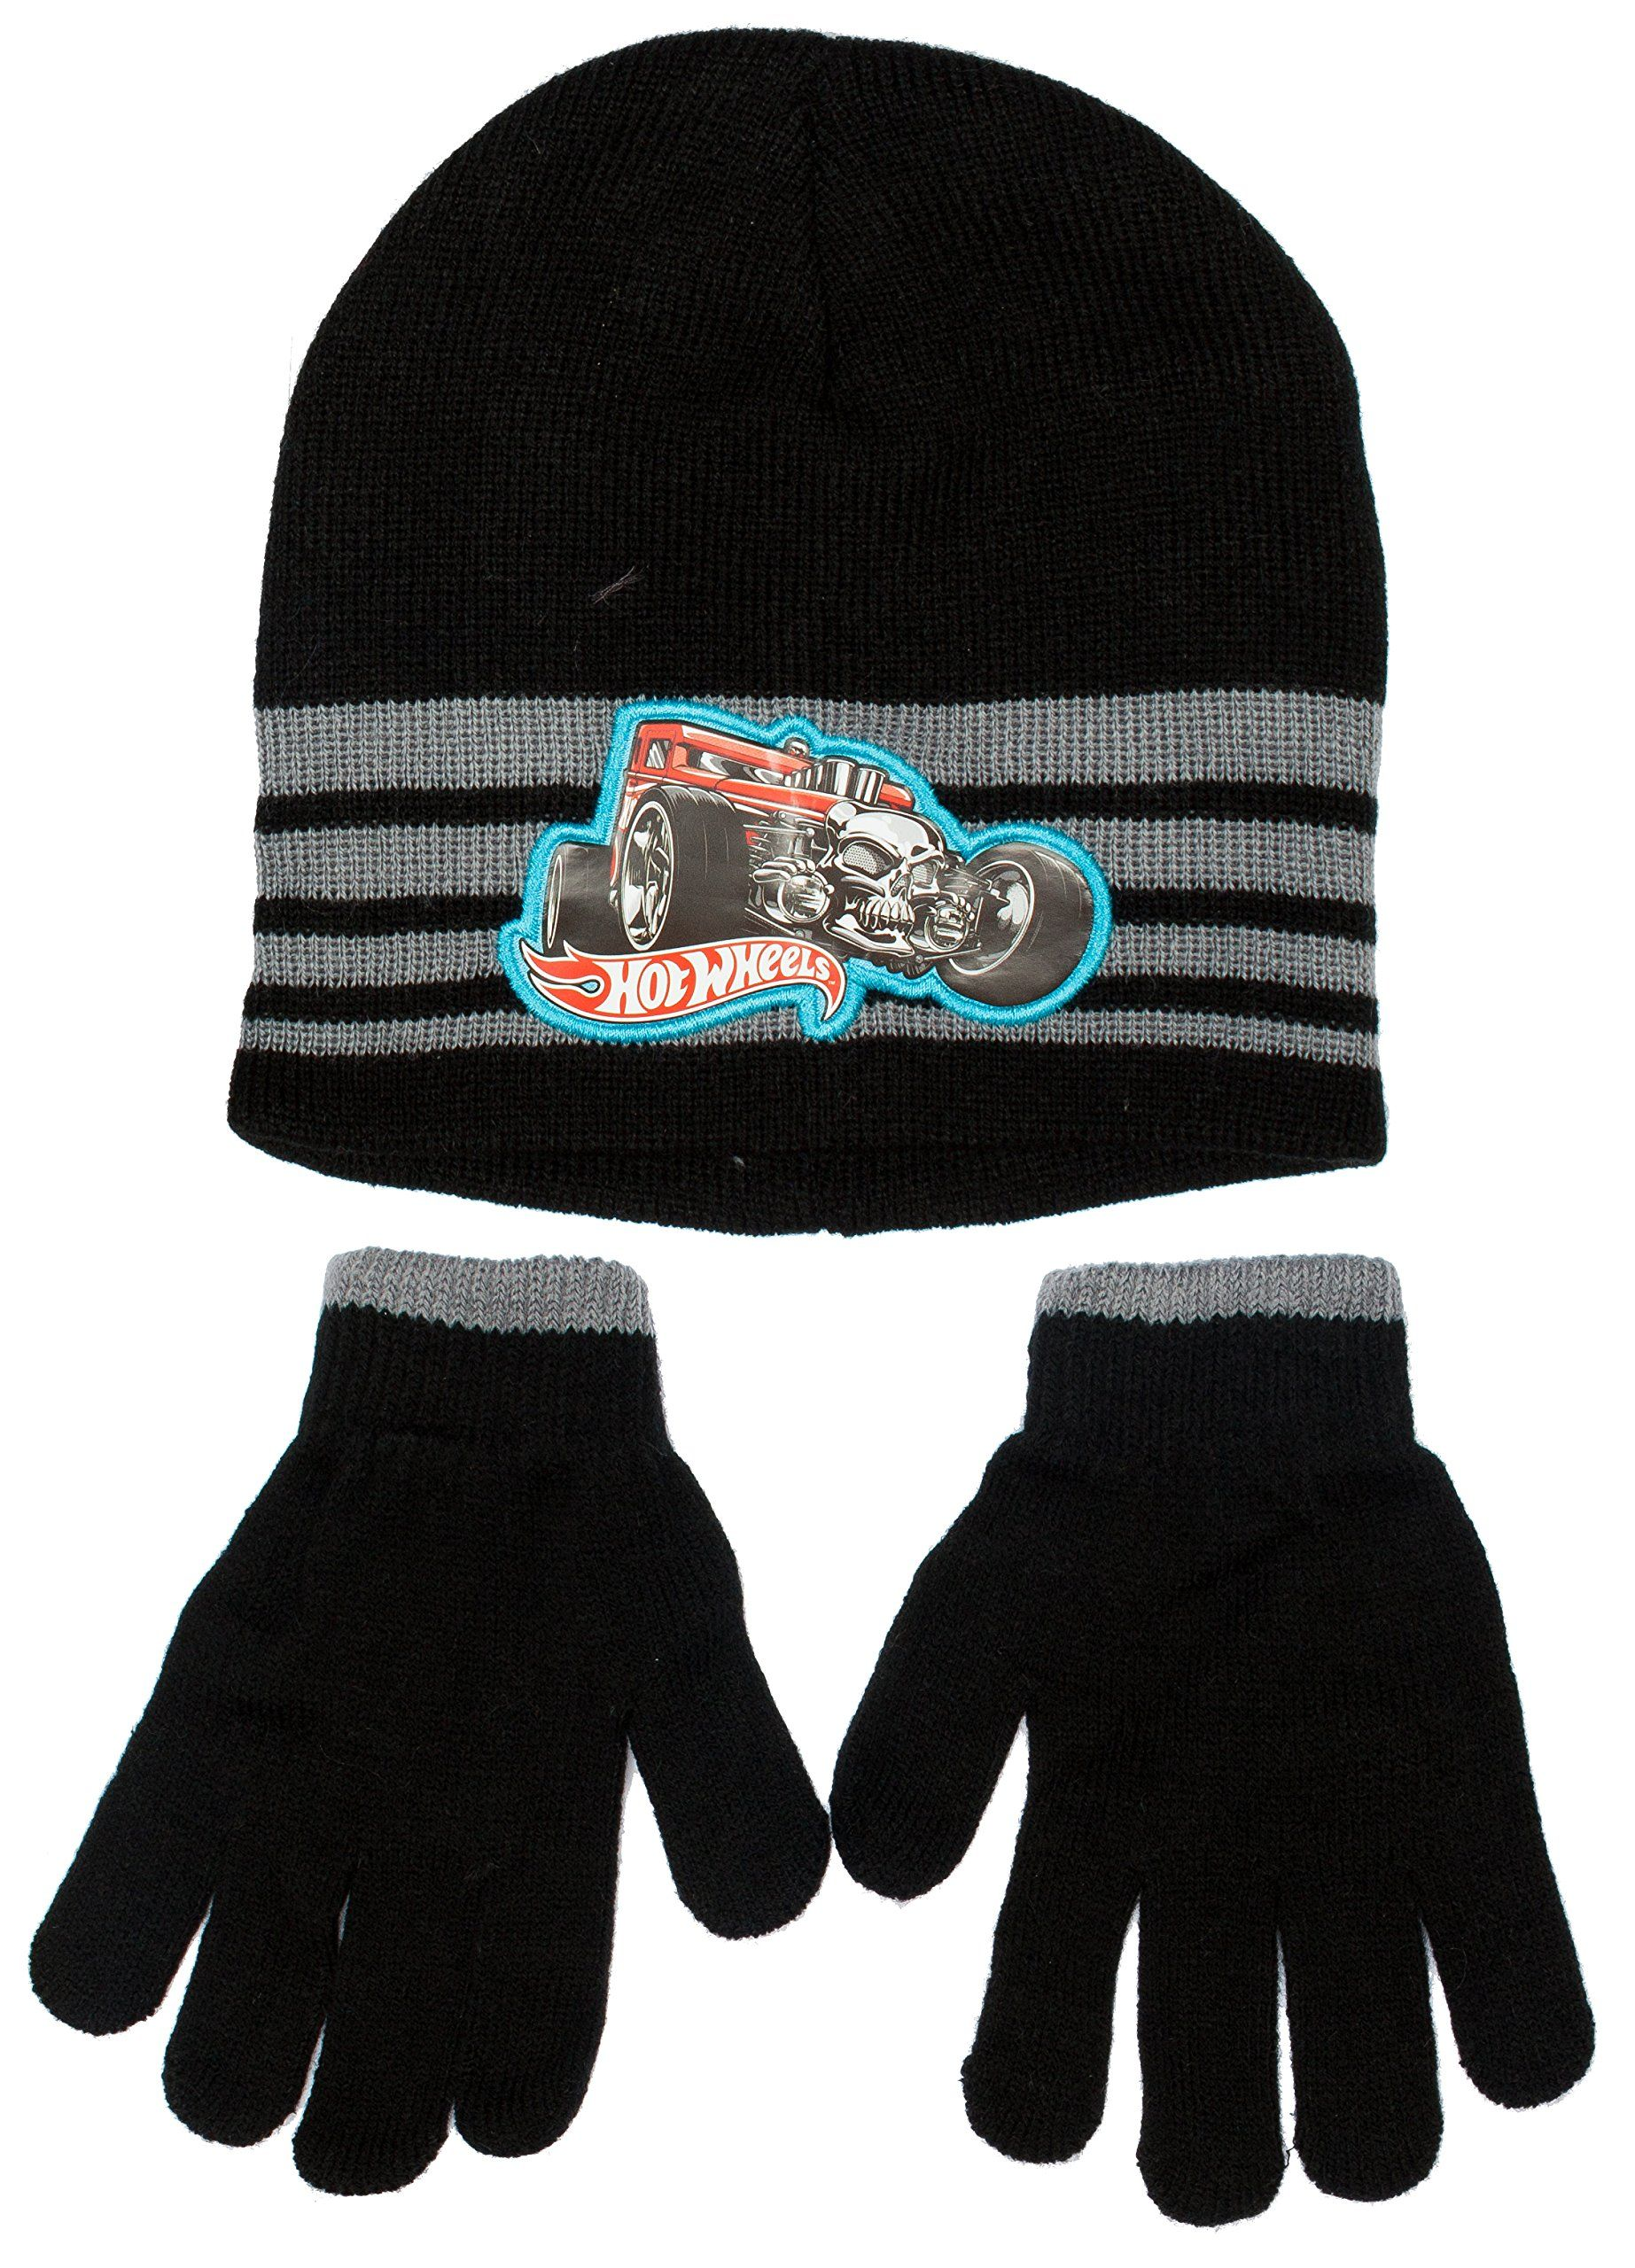 65883b9f6f4 Mattel Hot Wheels Winter Beanie Hat and Gloves Set